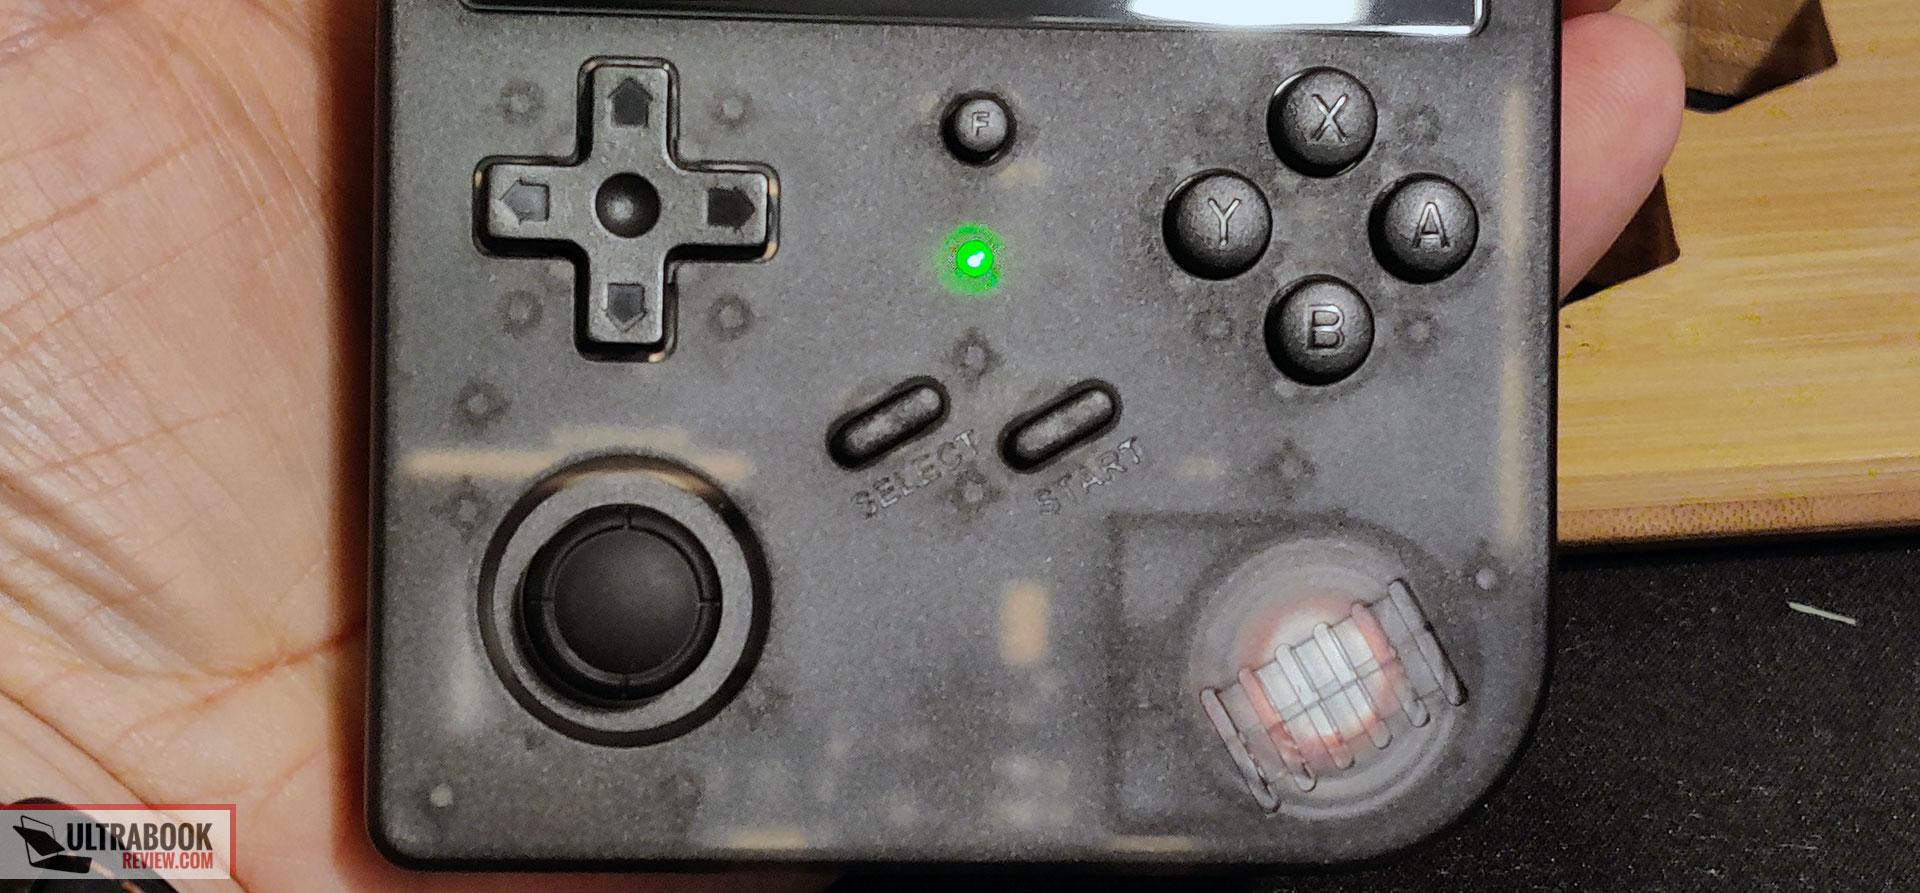 Anbernic RG351V buttons